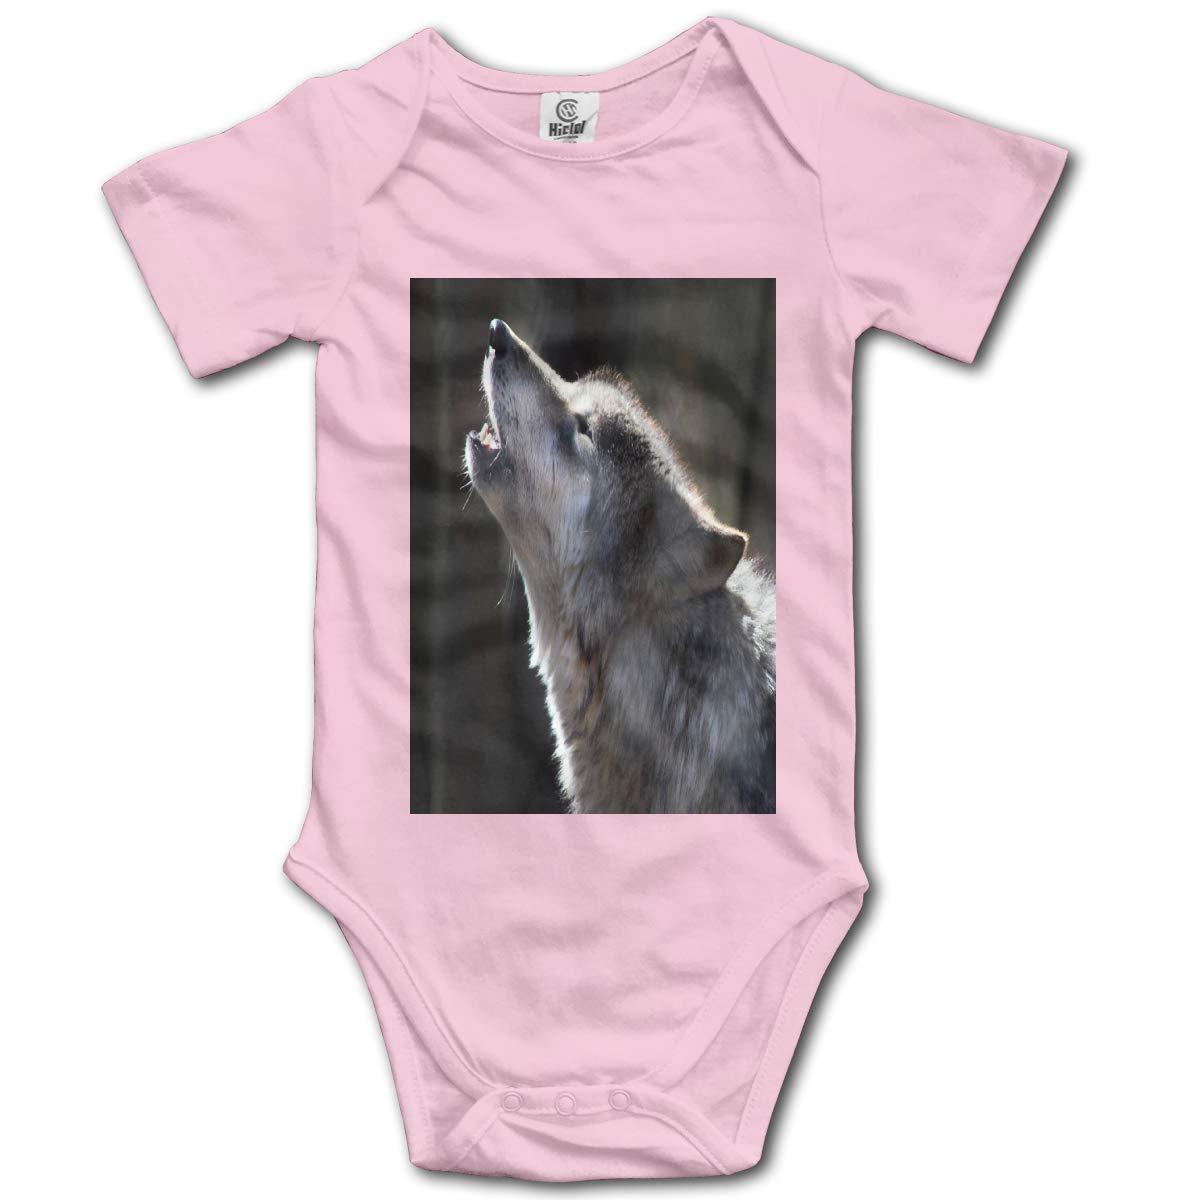 Forest Sunshine Wolf Boys /& Girls Black Short Sleeve Romper Bodysuit Outfits for 0-24 Months